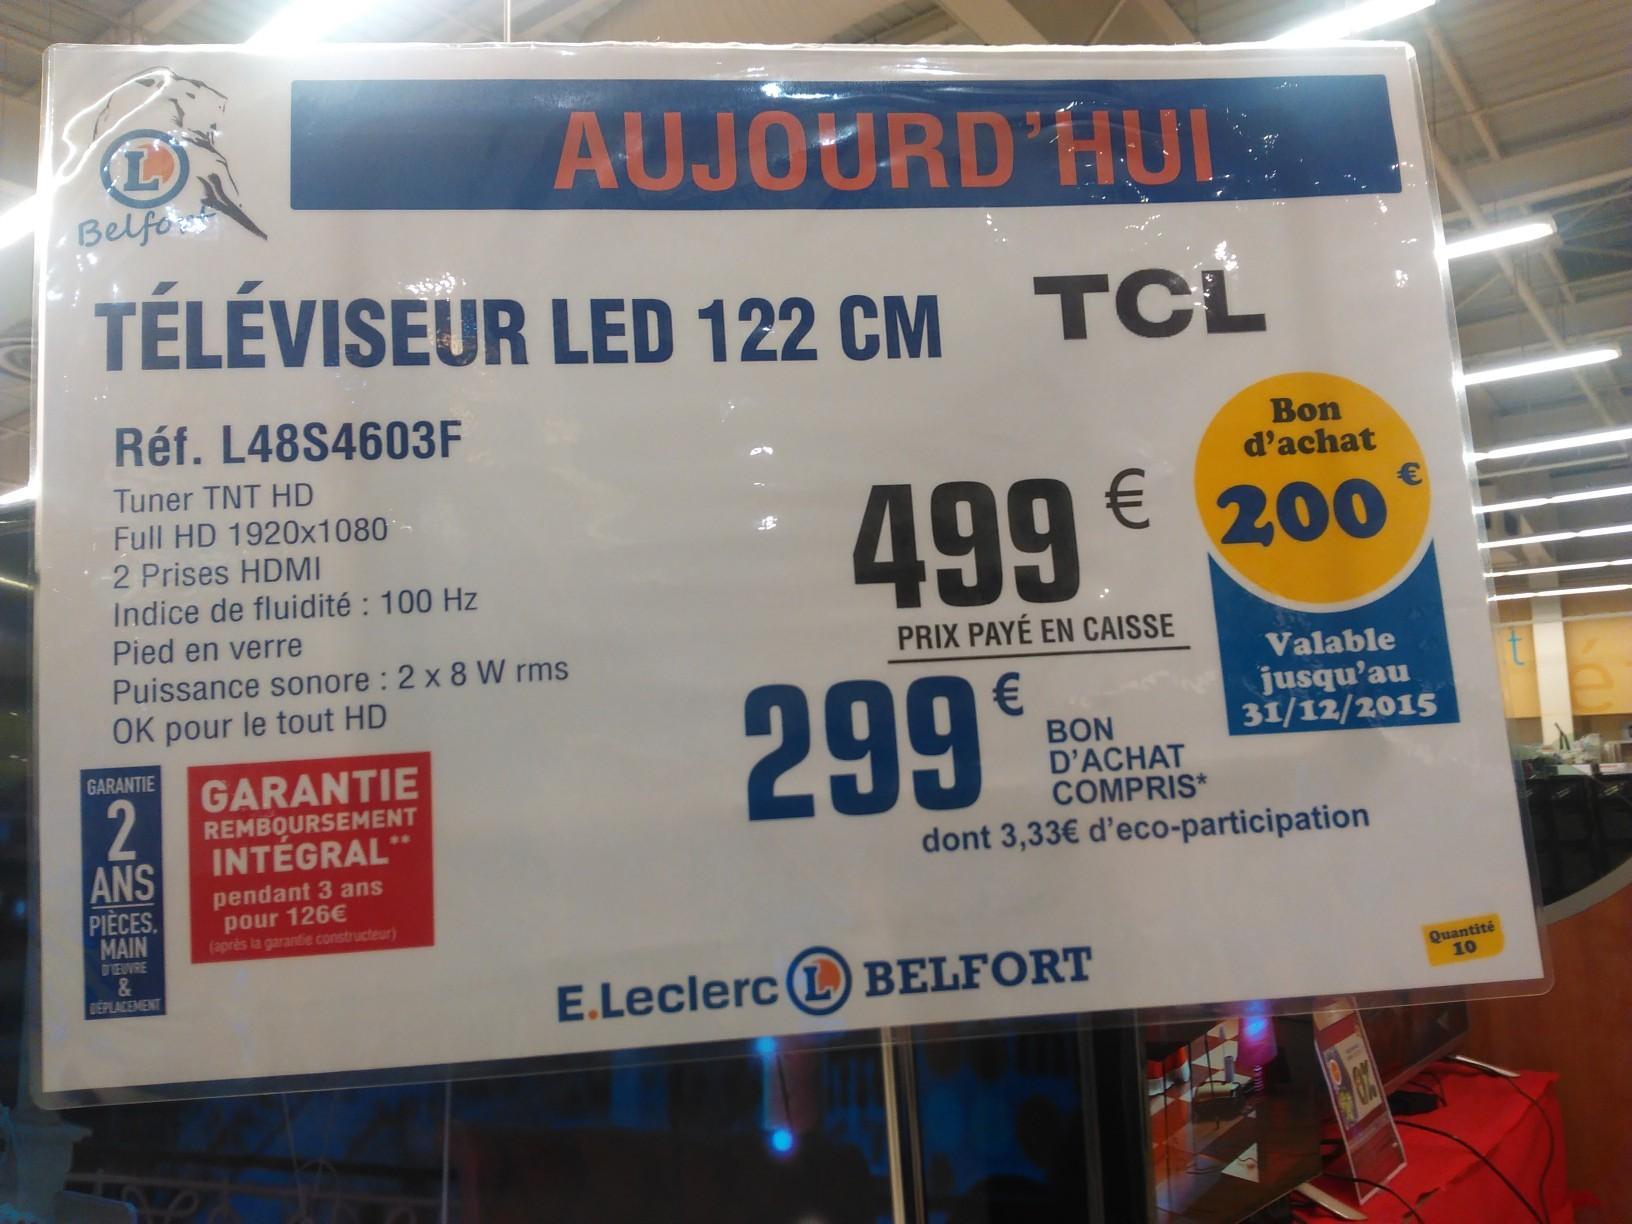 "TV 48"" TCL L48S4603F Full HD LED 121 cm (avec 200€ offerts en bon d'achat)"